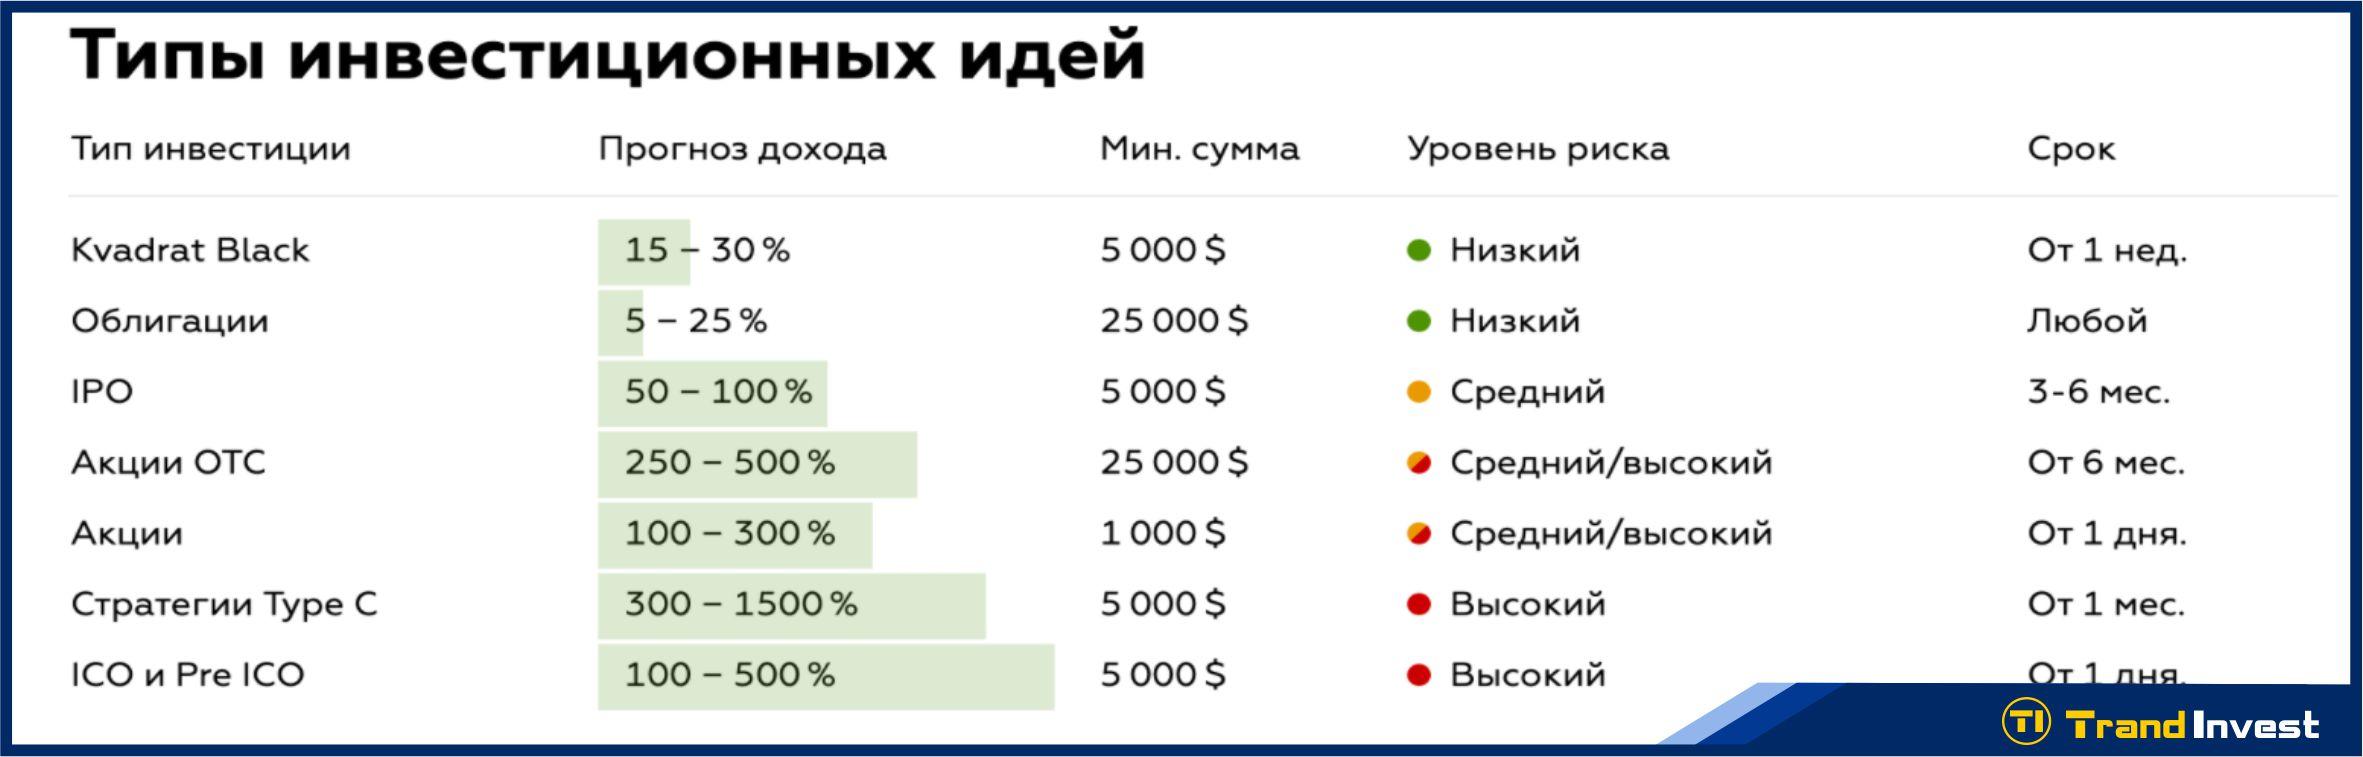 Freedom Finance инвестиции